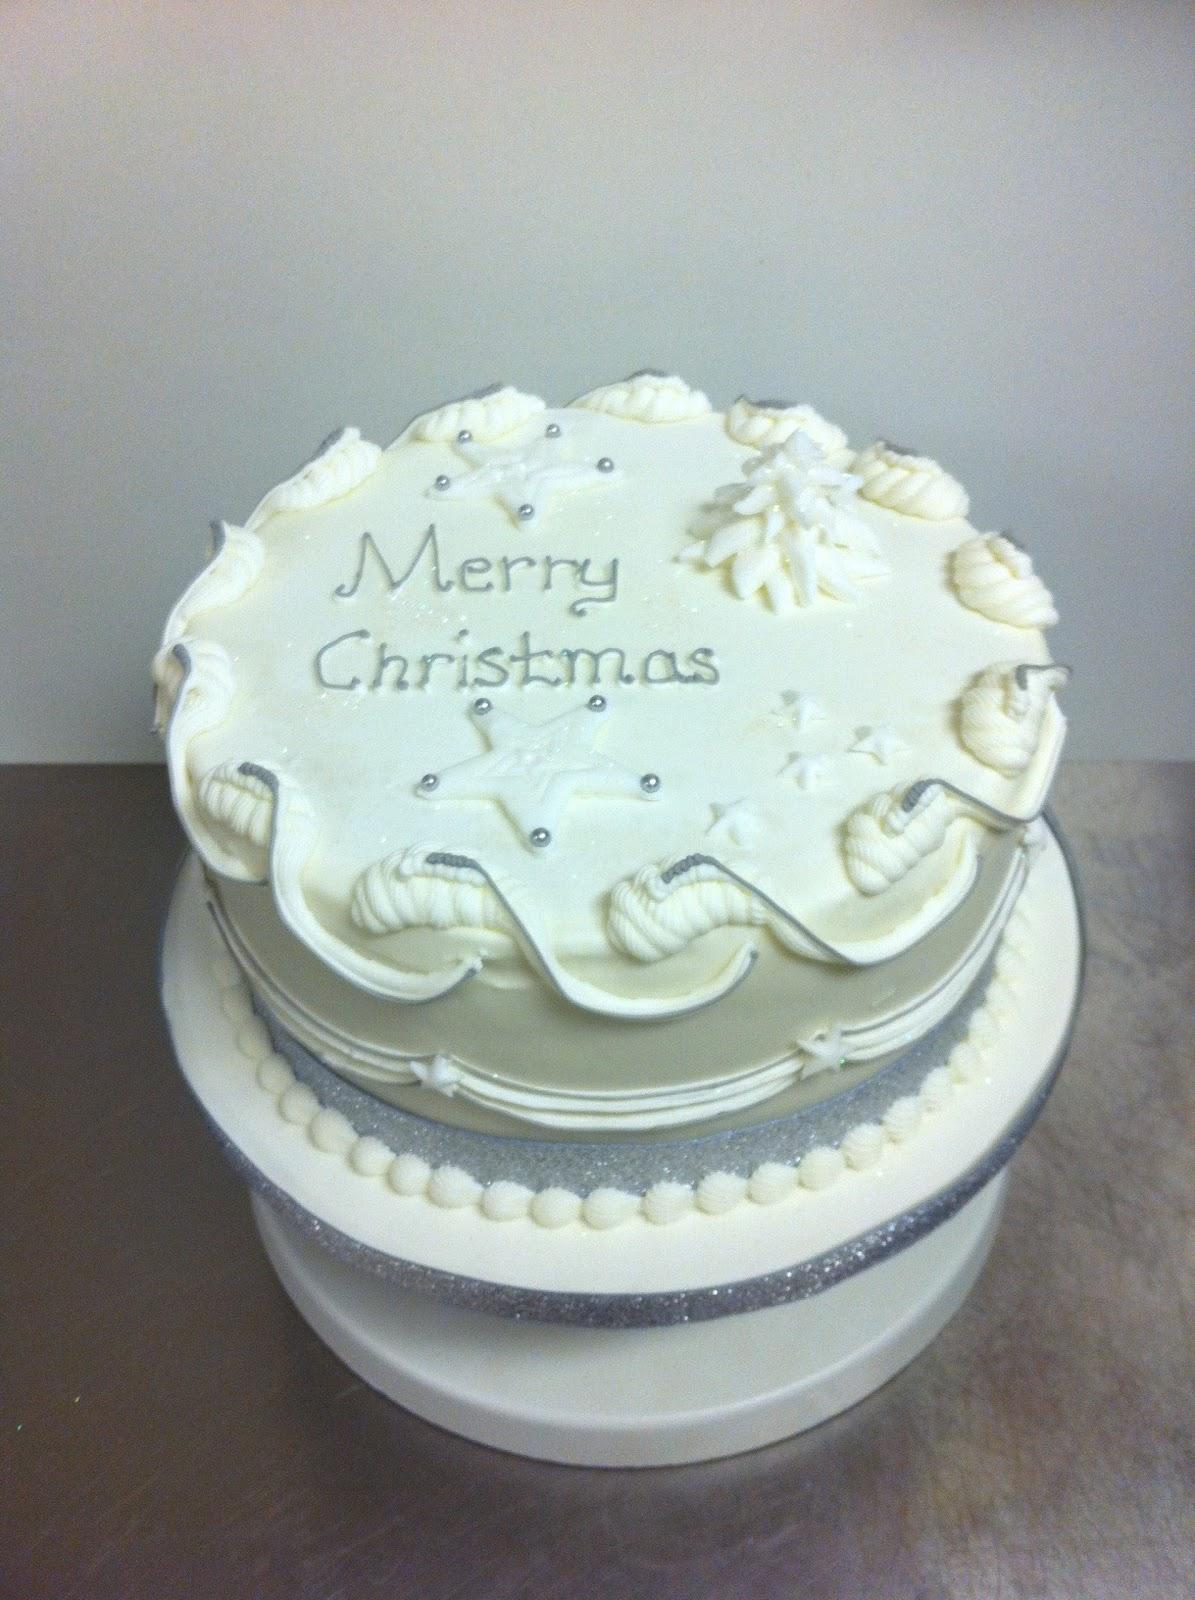 Christmas Cake Decoration Ideas Royal Icing : Brigitta s Cakes: Christmas cake with Royal Icing